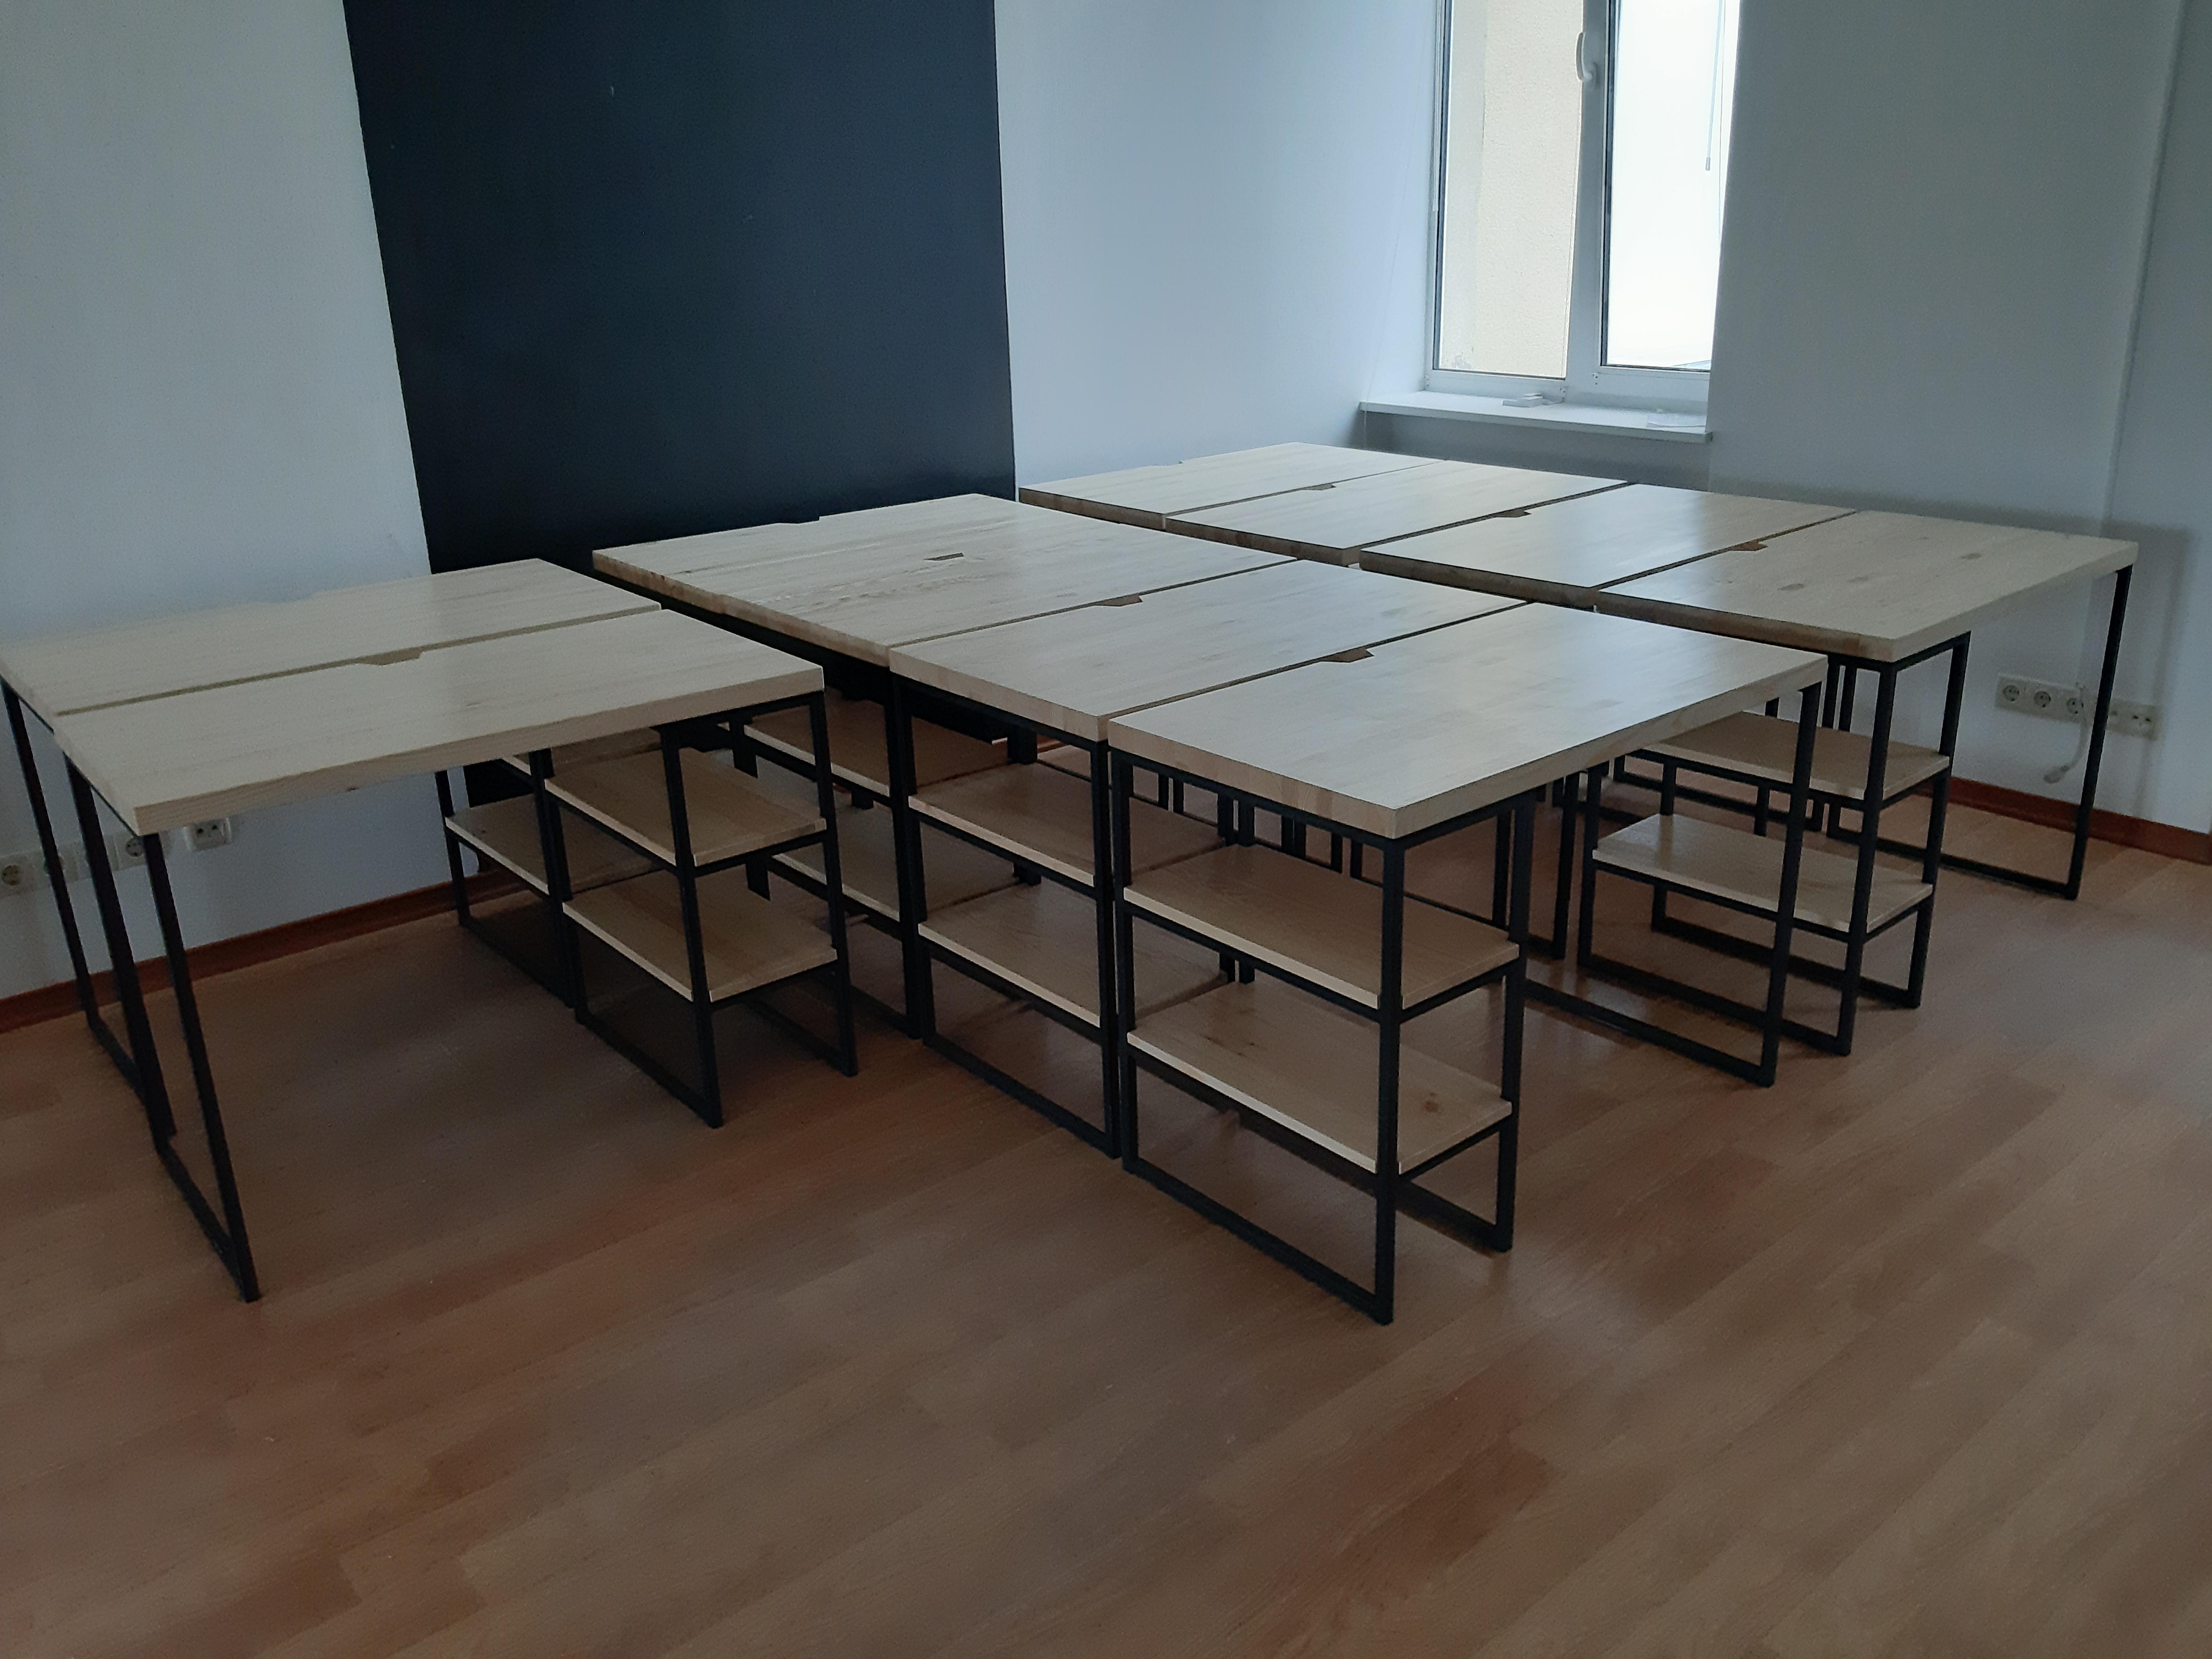 Фото Сборка 10 столов для офиса